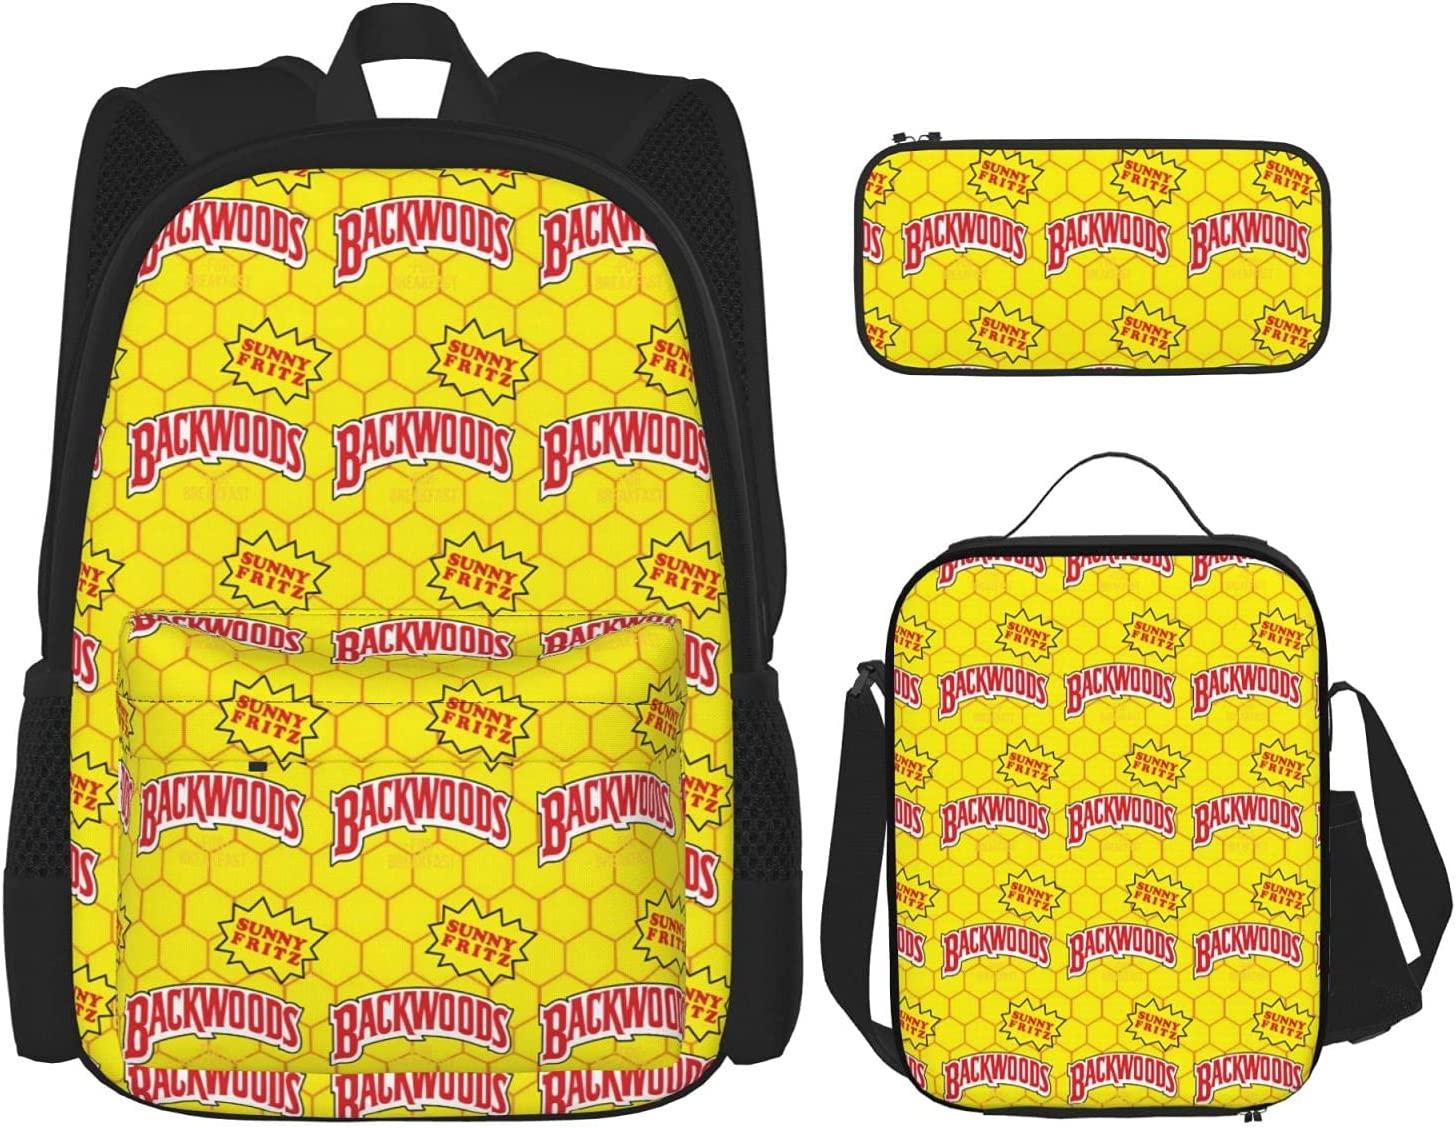 Backwoods Fashion Backpack Messenger Lunch Max 89% OFF Set Bag Pencil Max 65% OFF Ba